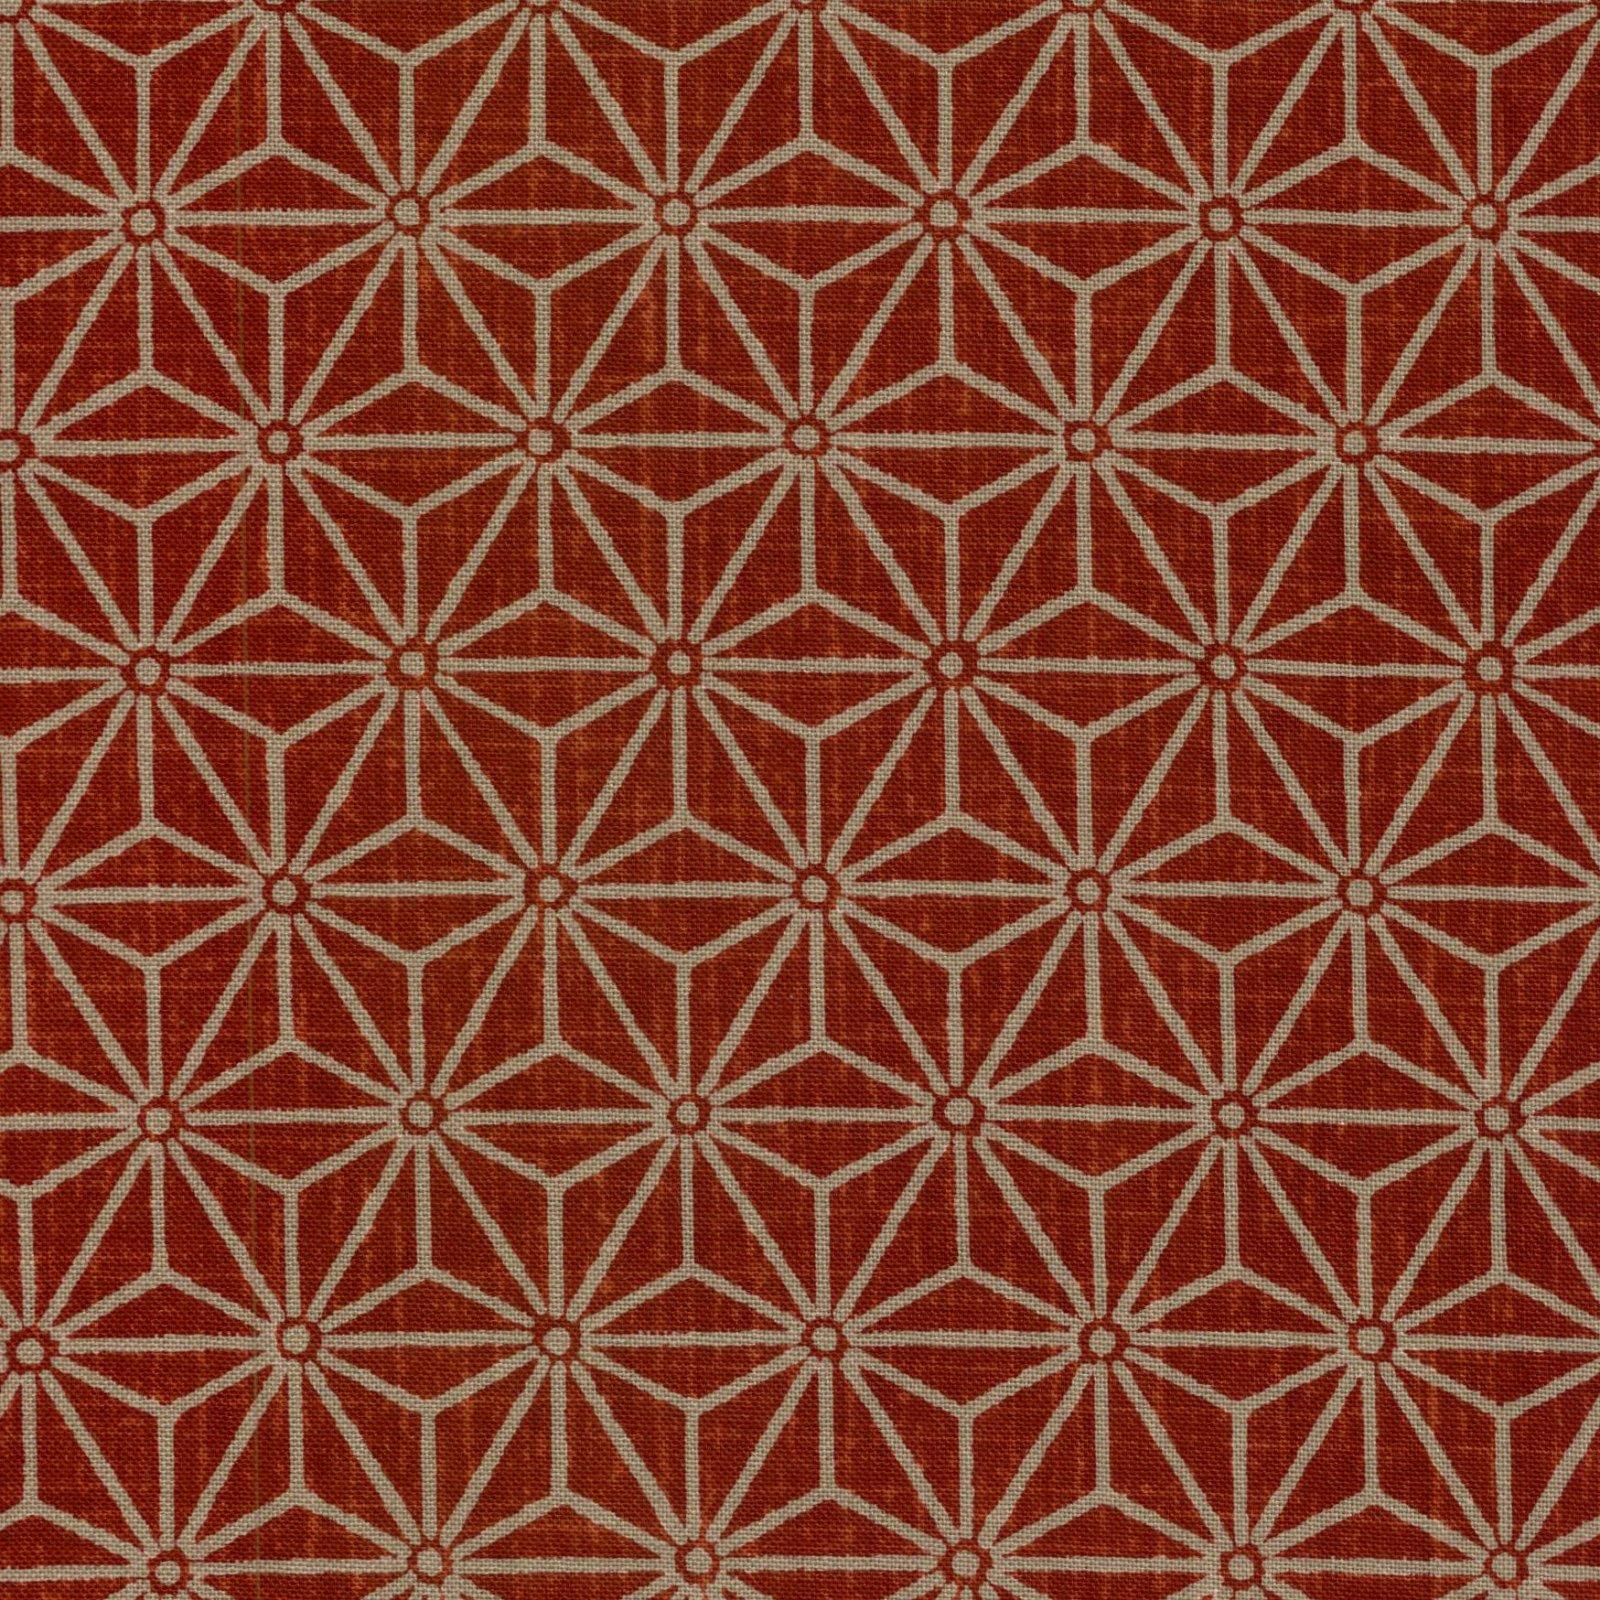 Westex - Burnt Red Hemp Leaf or Asano-ha Tan on Red KW3655-1C